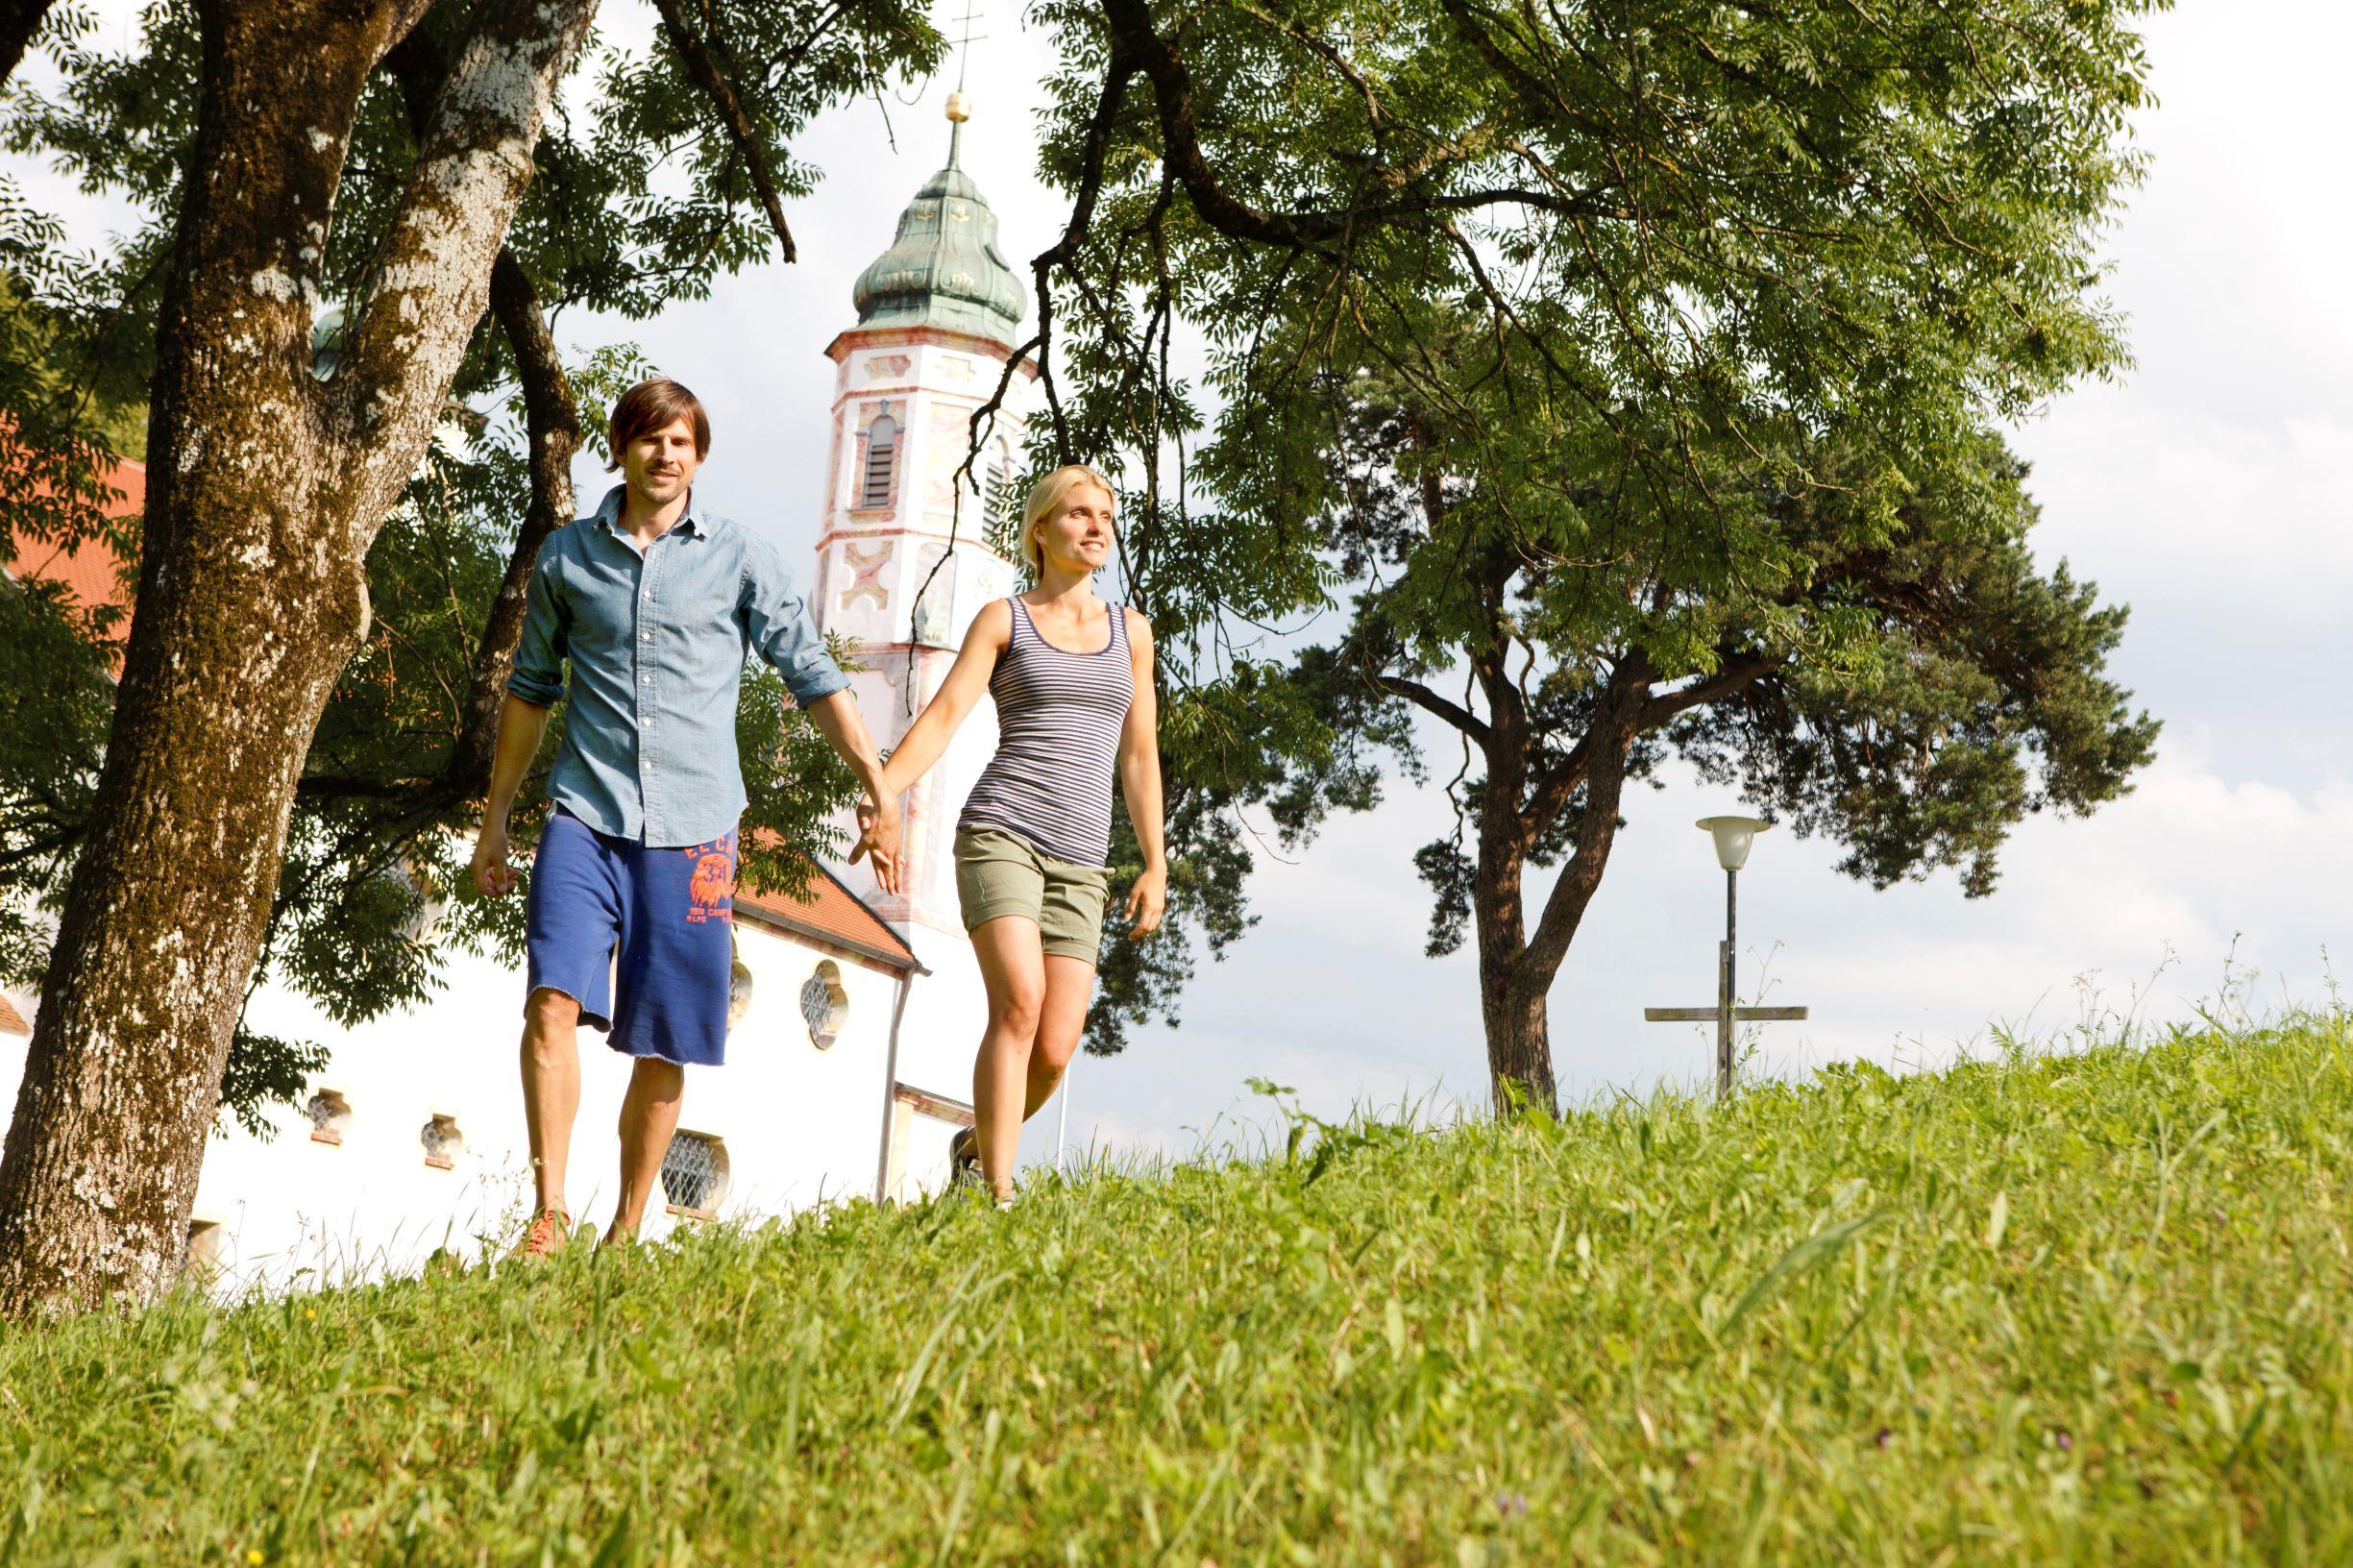 Spaziergang auf dem Kalvarienberg